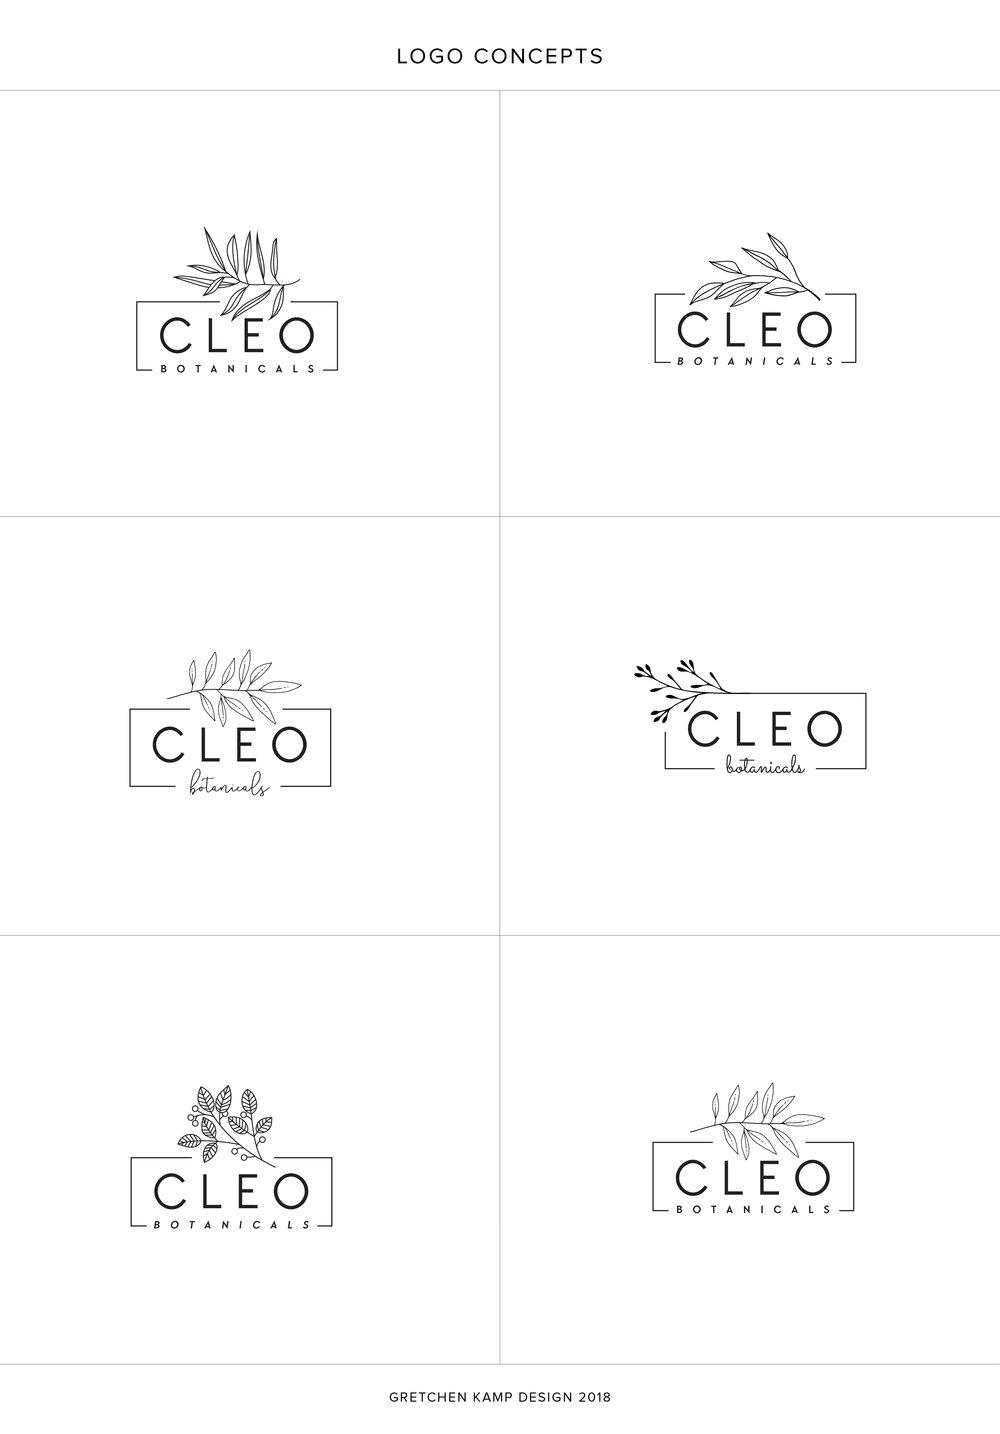 Cleo_Sugaring_Logos_v03-01.jpg